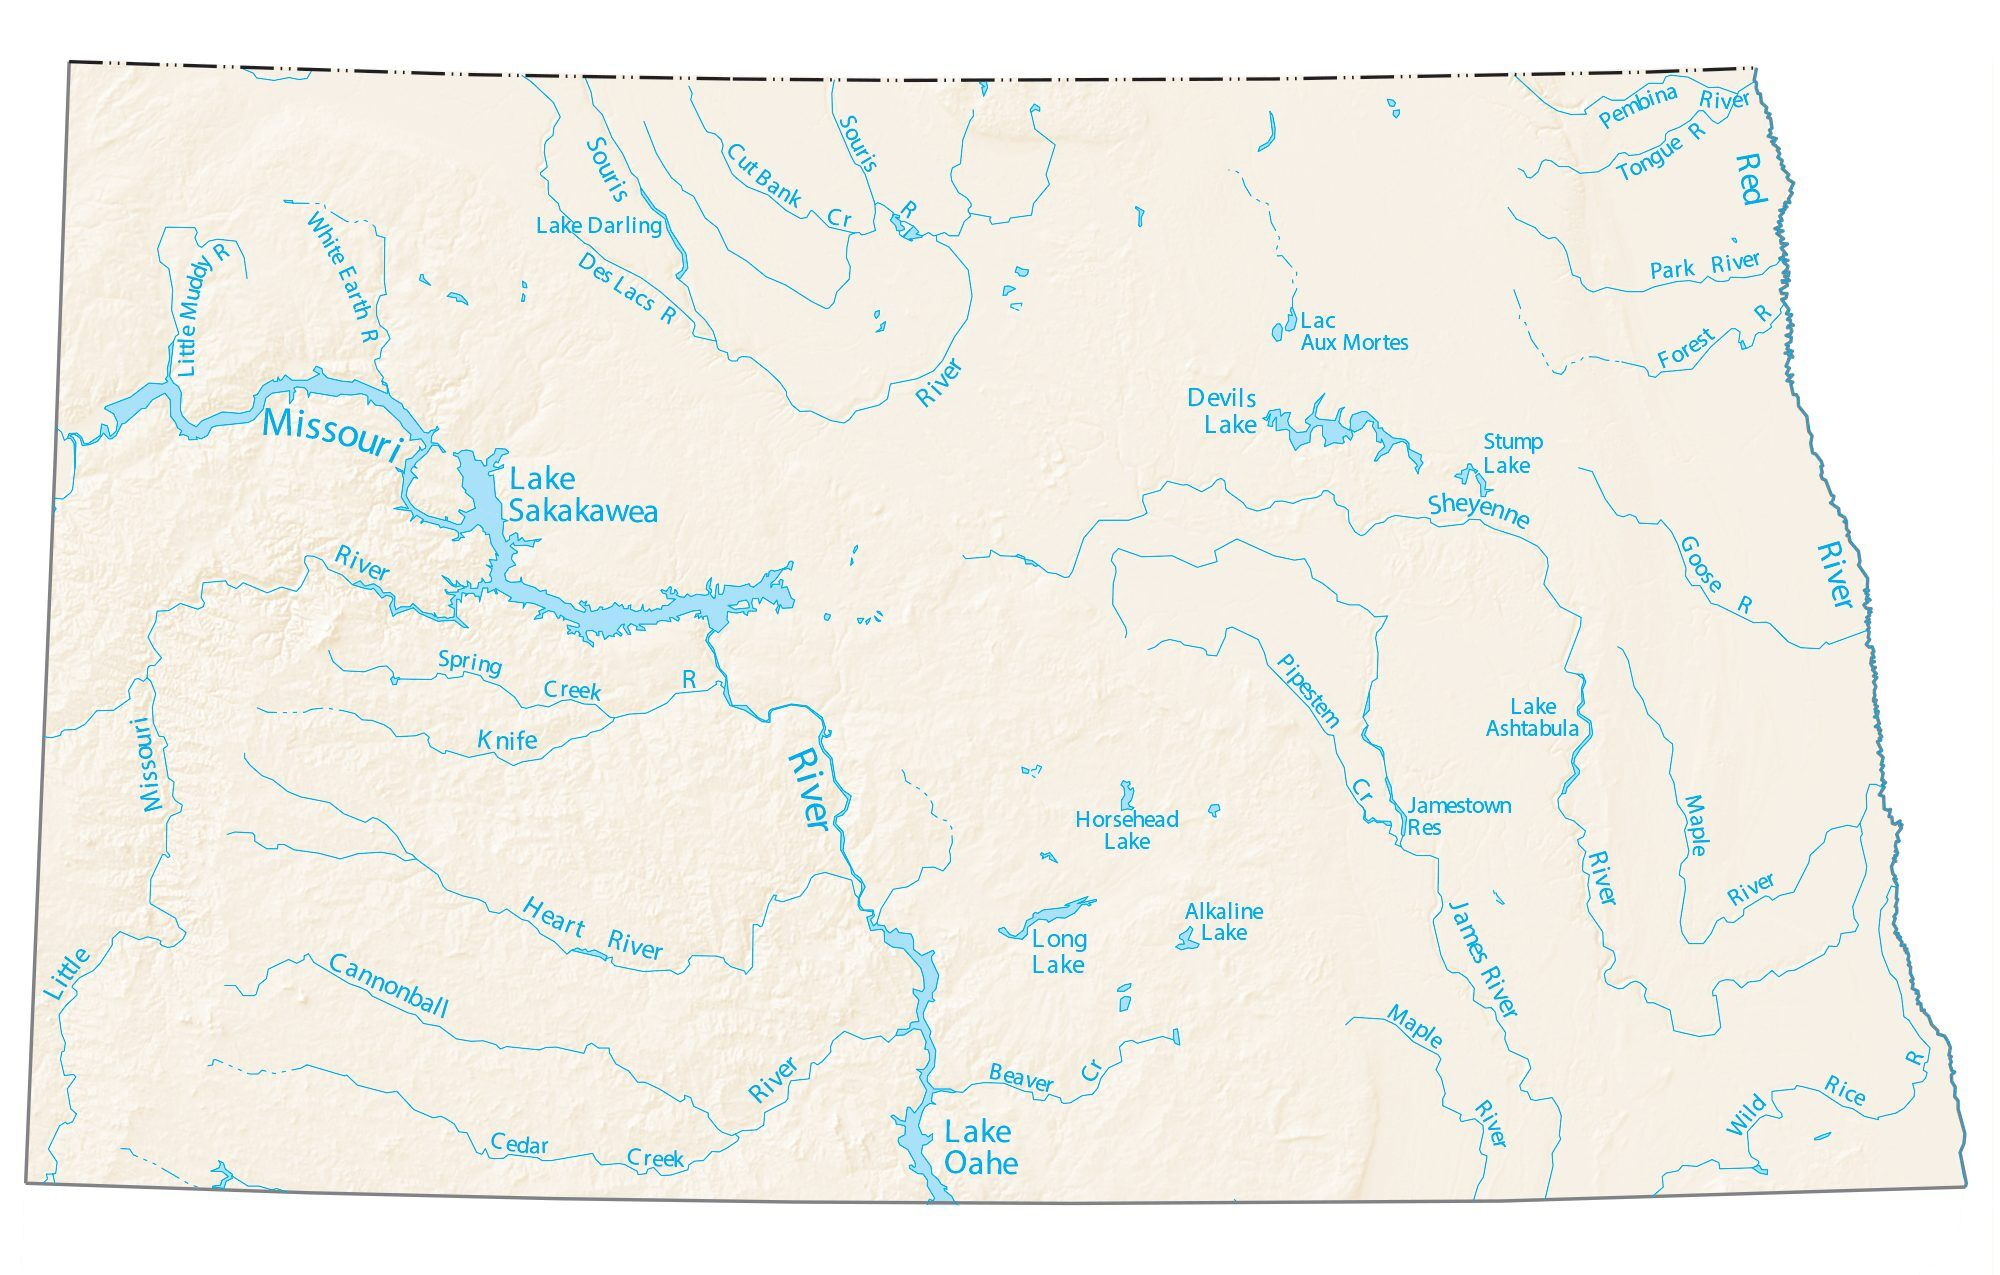 devils lake north dakota map North Dakota Lakes And Rivers Map Gis Geography devils lake north dakota map